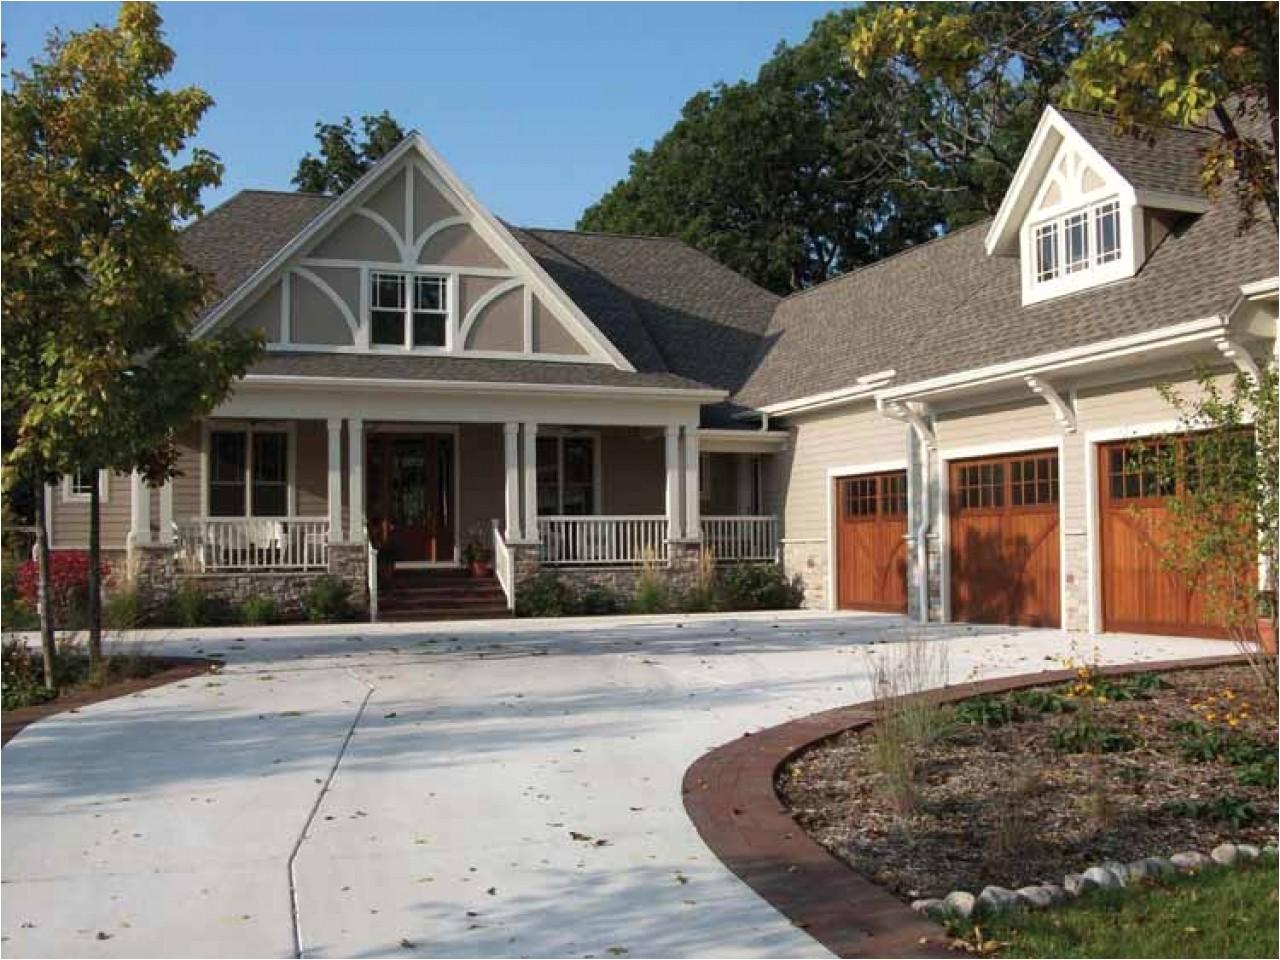 4faec4f4c16ee61a award winning craftsman house plans craftsman style house plans